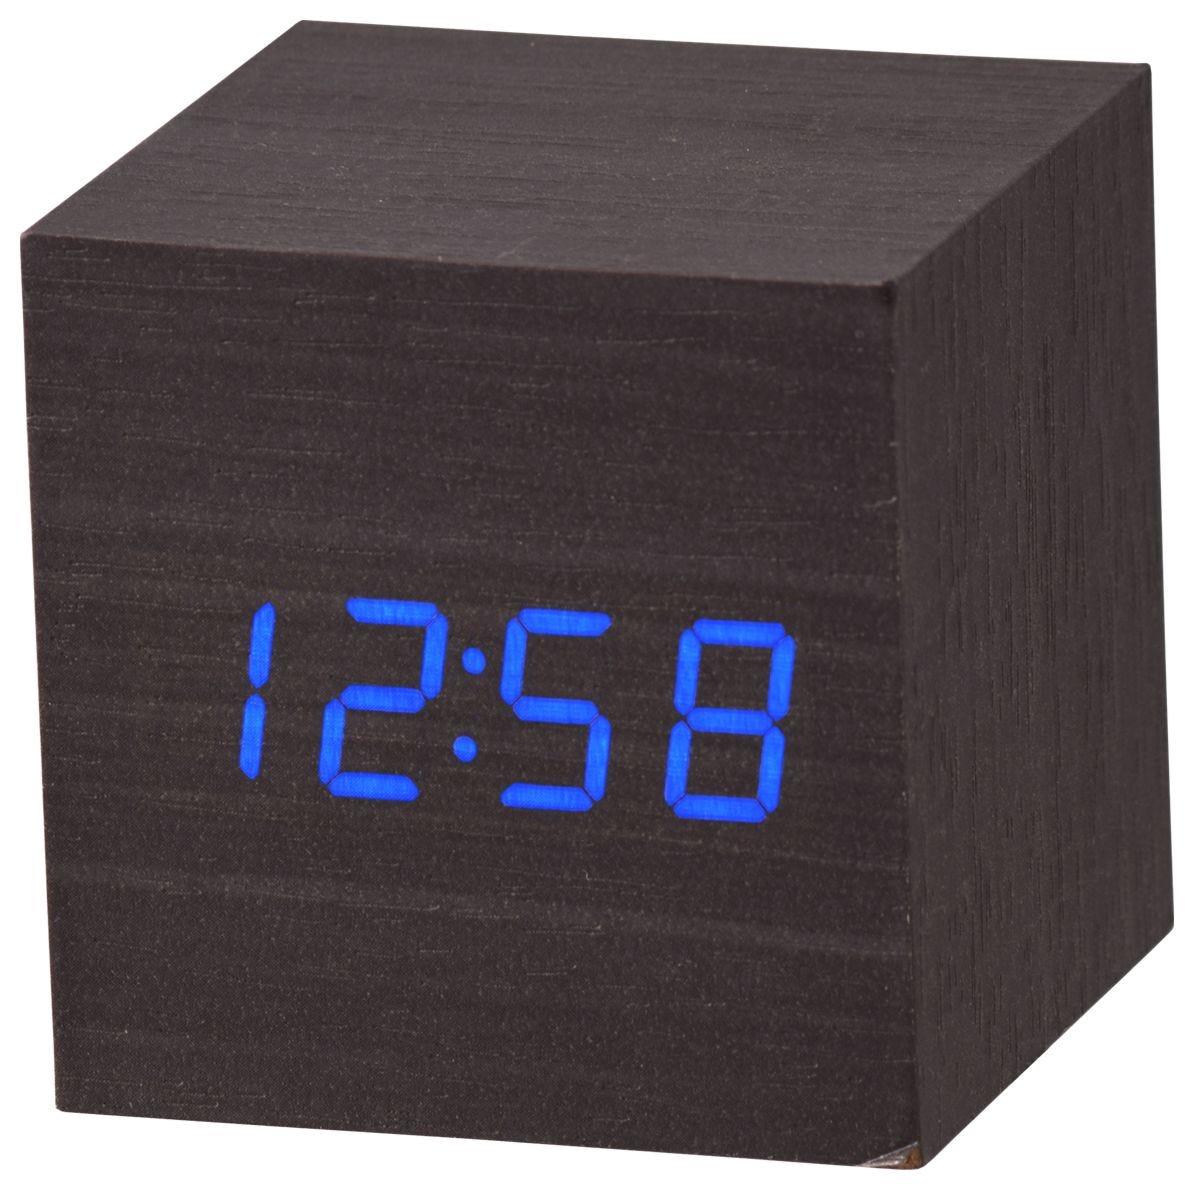 Acctim 'Ark' Cube LED Alarm Clock - Black Wood